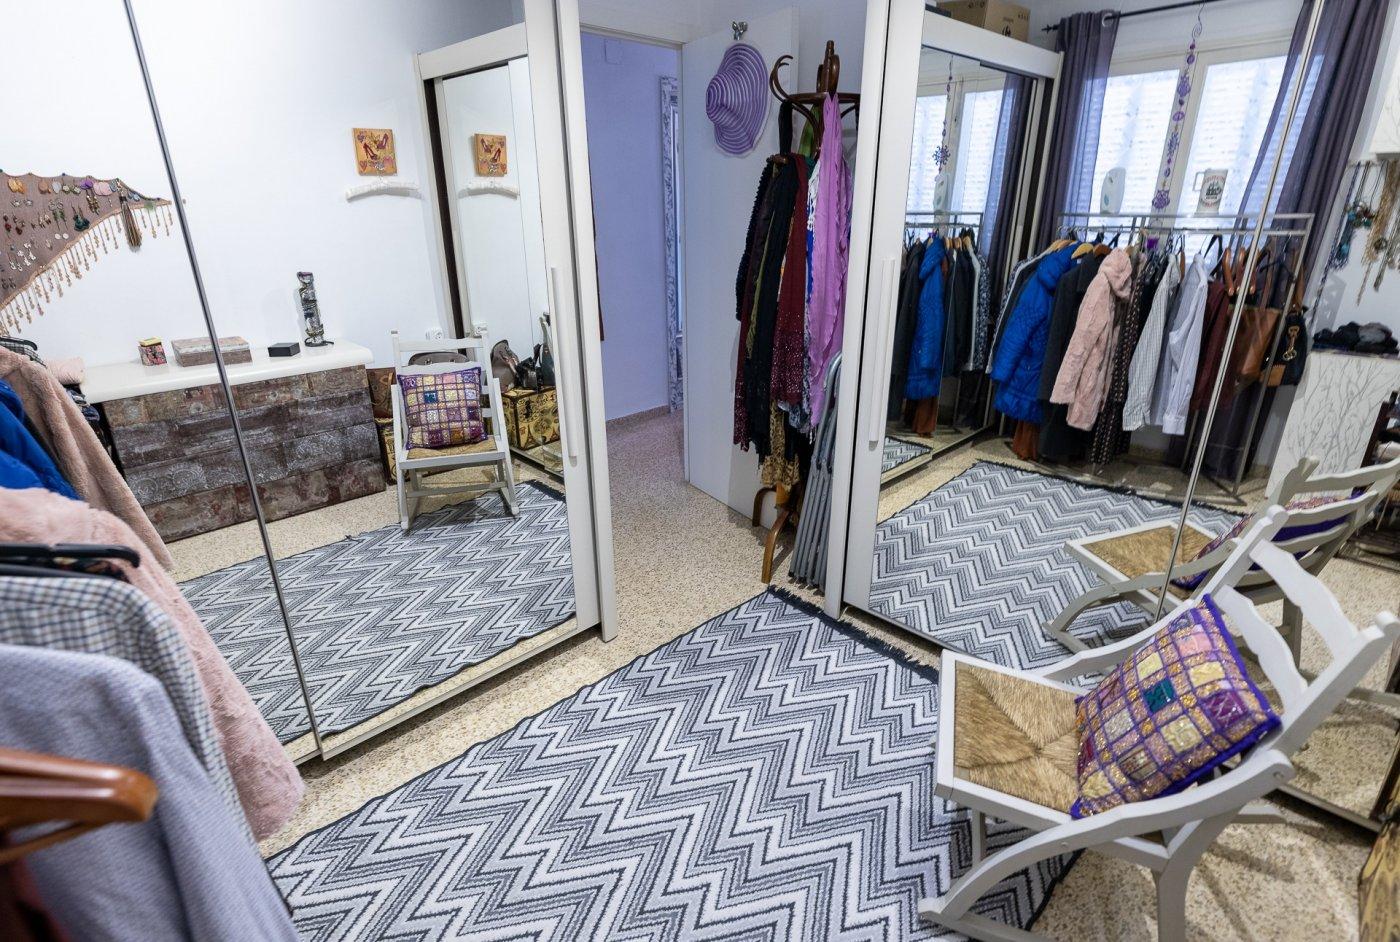 Interesante piso en arenal-llucmajor - imagenInmueble15